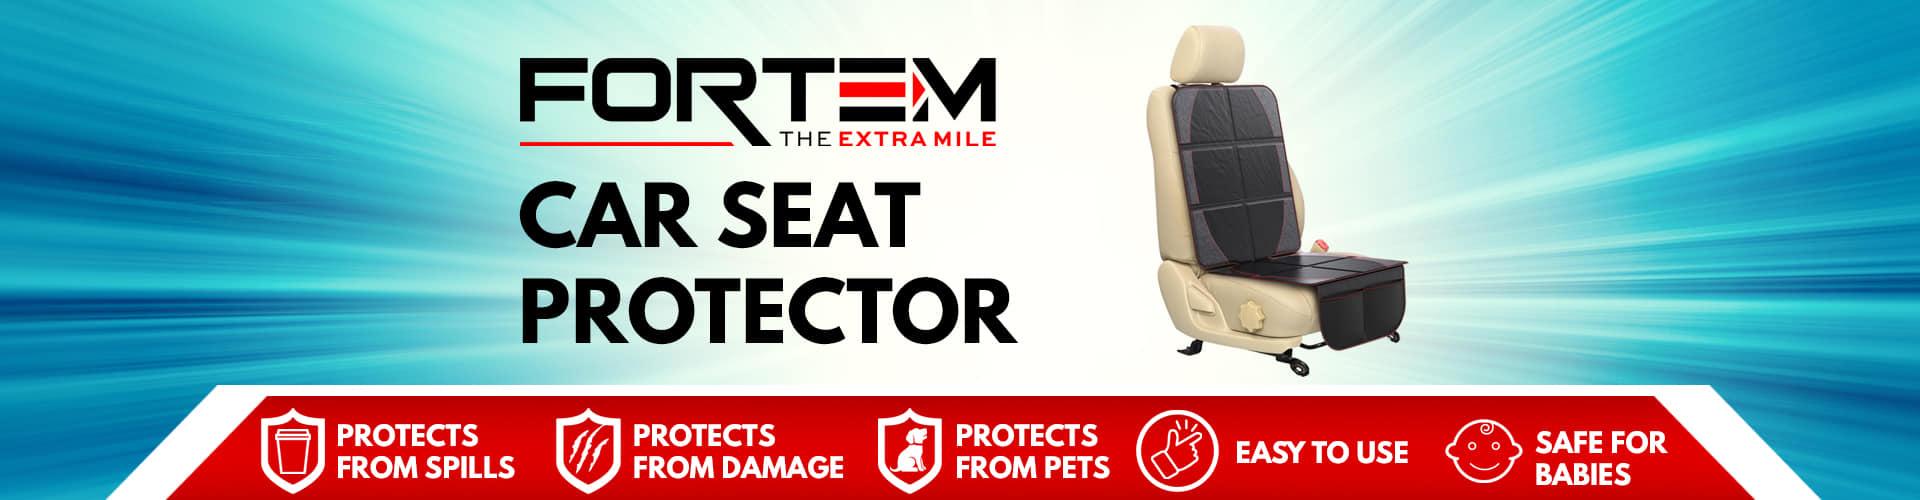 Car Seat Protector Fortem